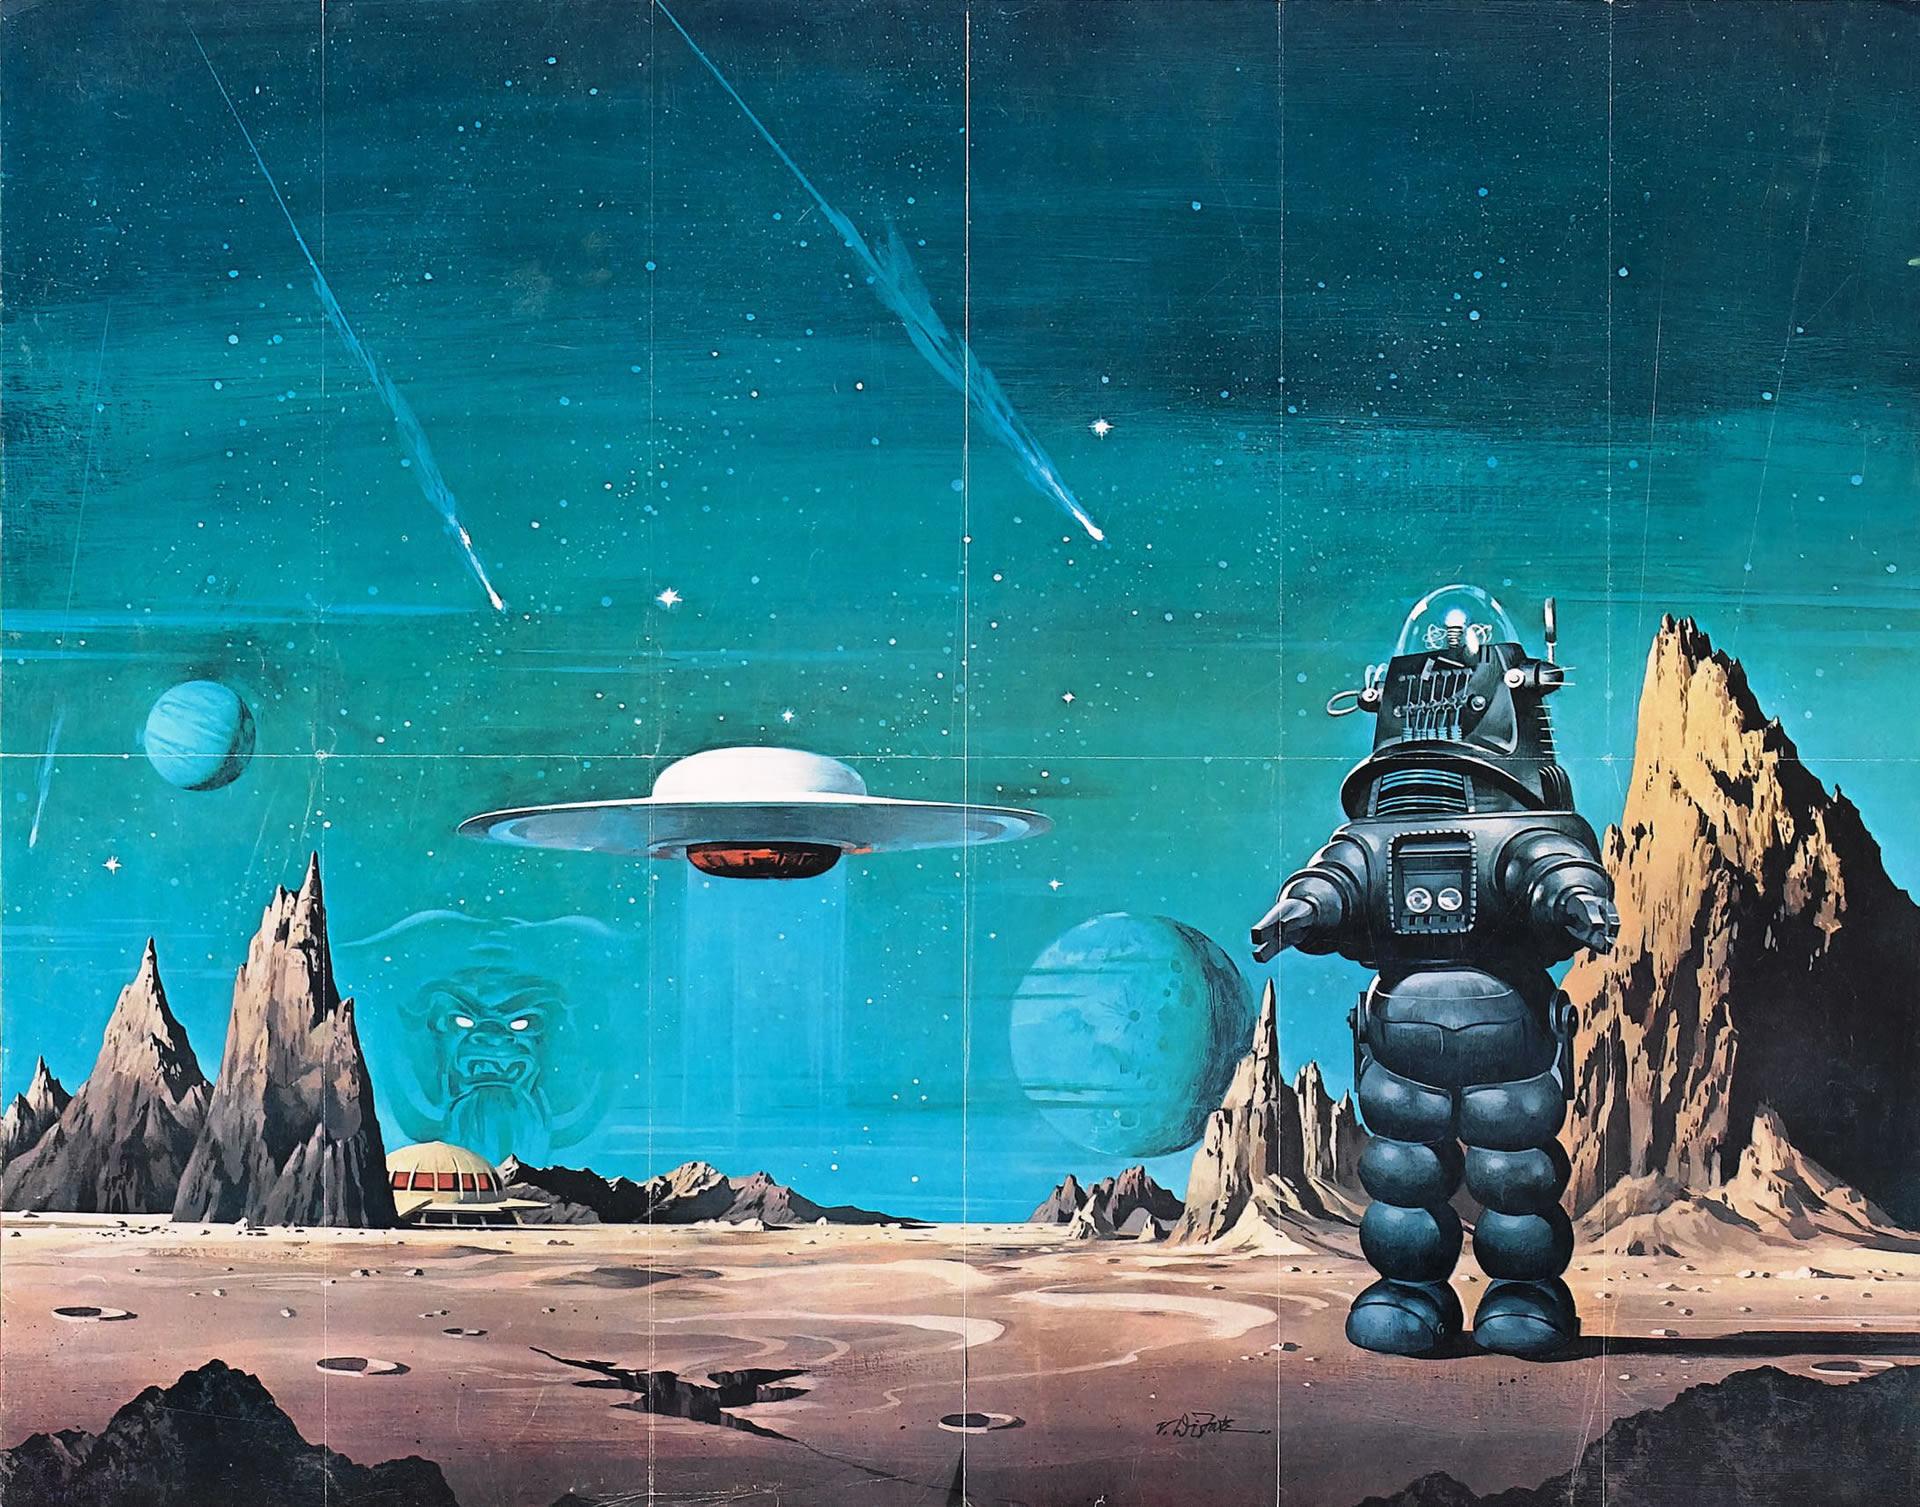 Forbidden Planet Iii   1950s B Movie Posters Wallpaper Image 1920x1507